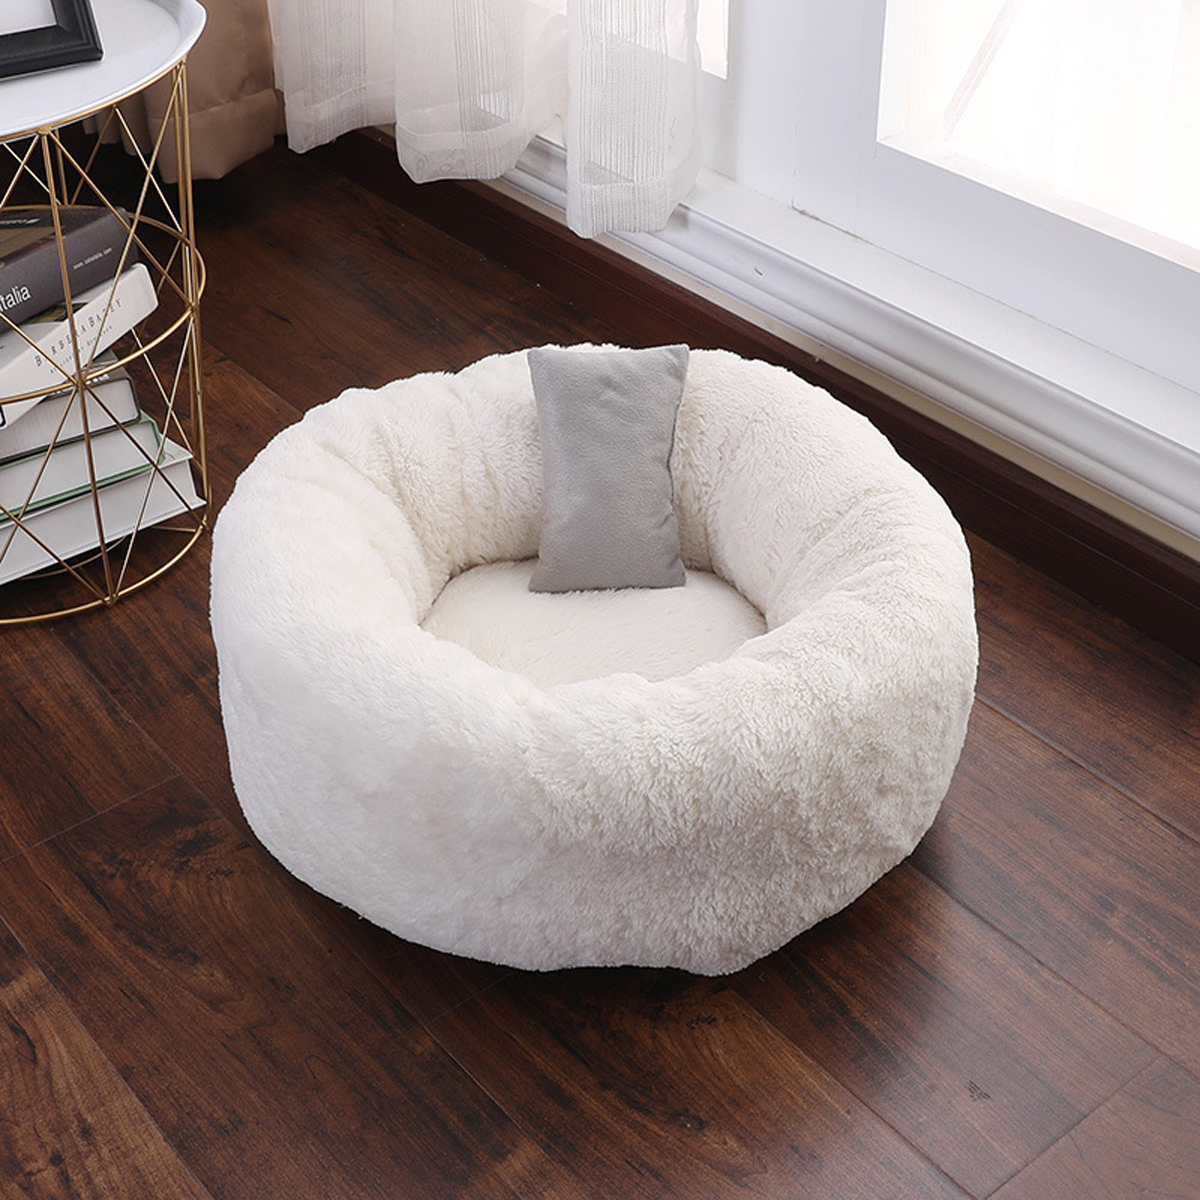 Large Shaggy Fluffy Fur Pet Bed Dog Puppy Cat Kitten Donut